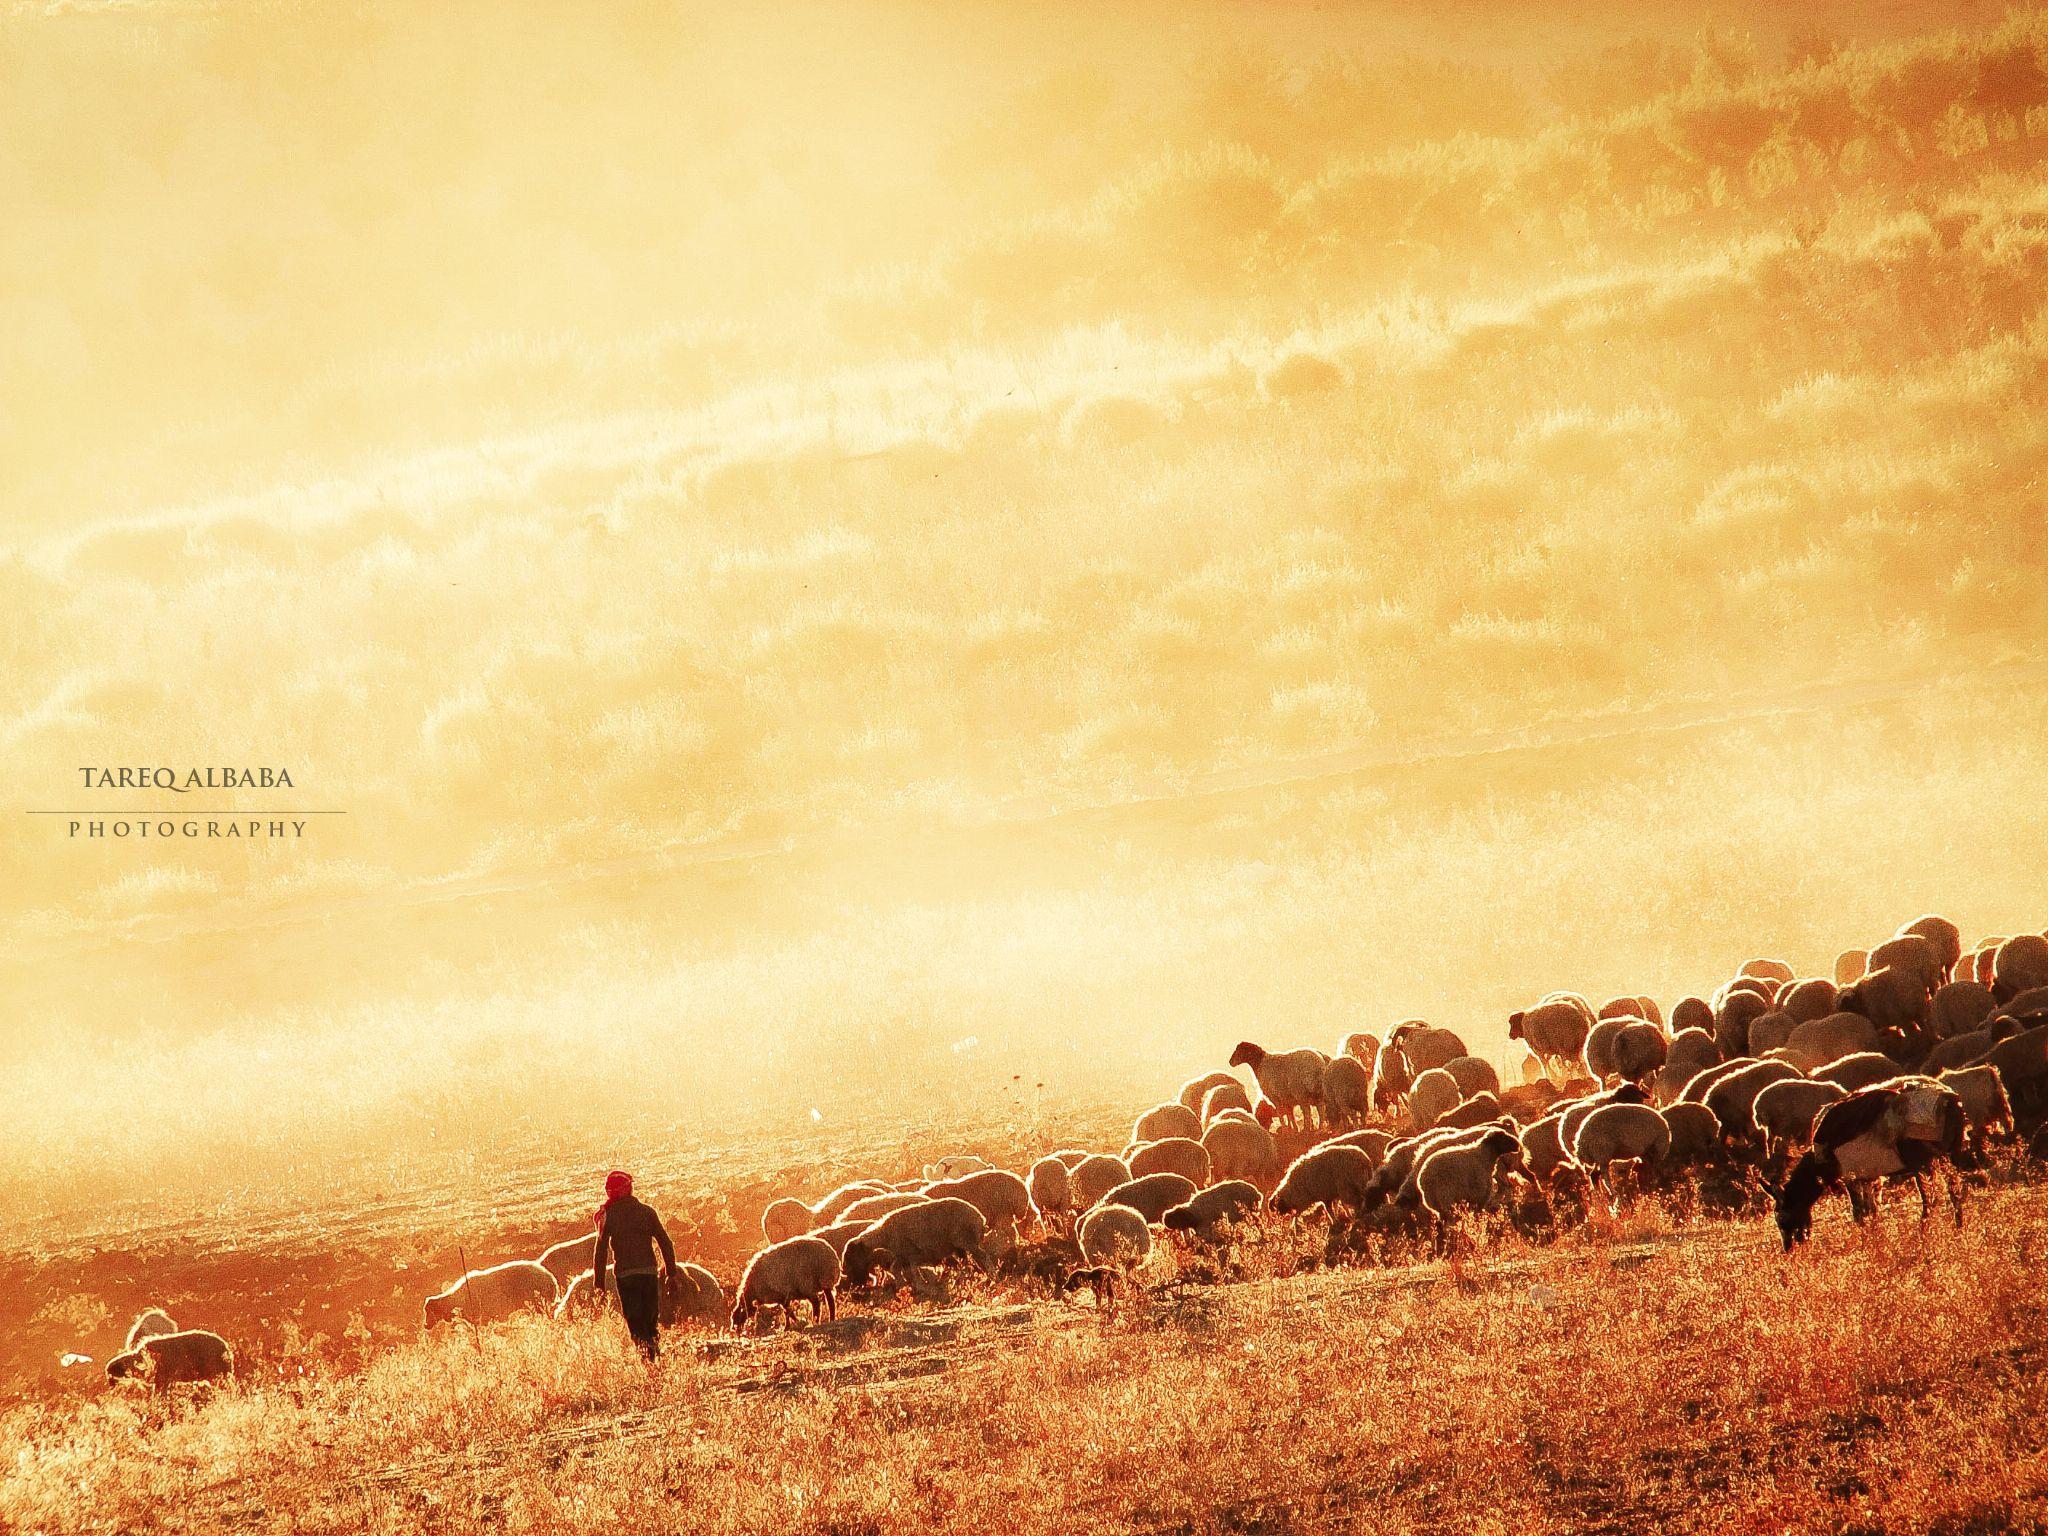 Lebanese-Syrian border areas | 16.9.2013 by Tareq Albaba